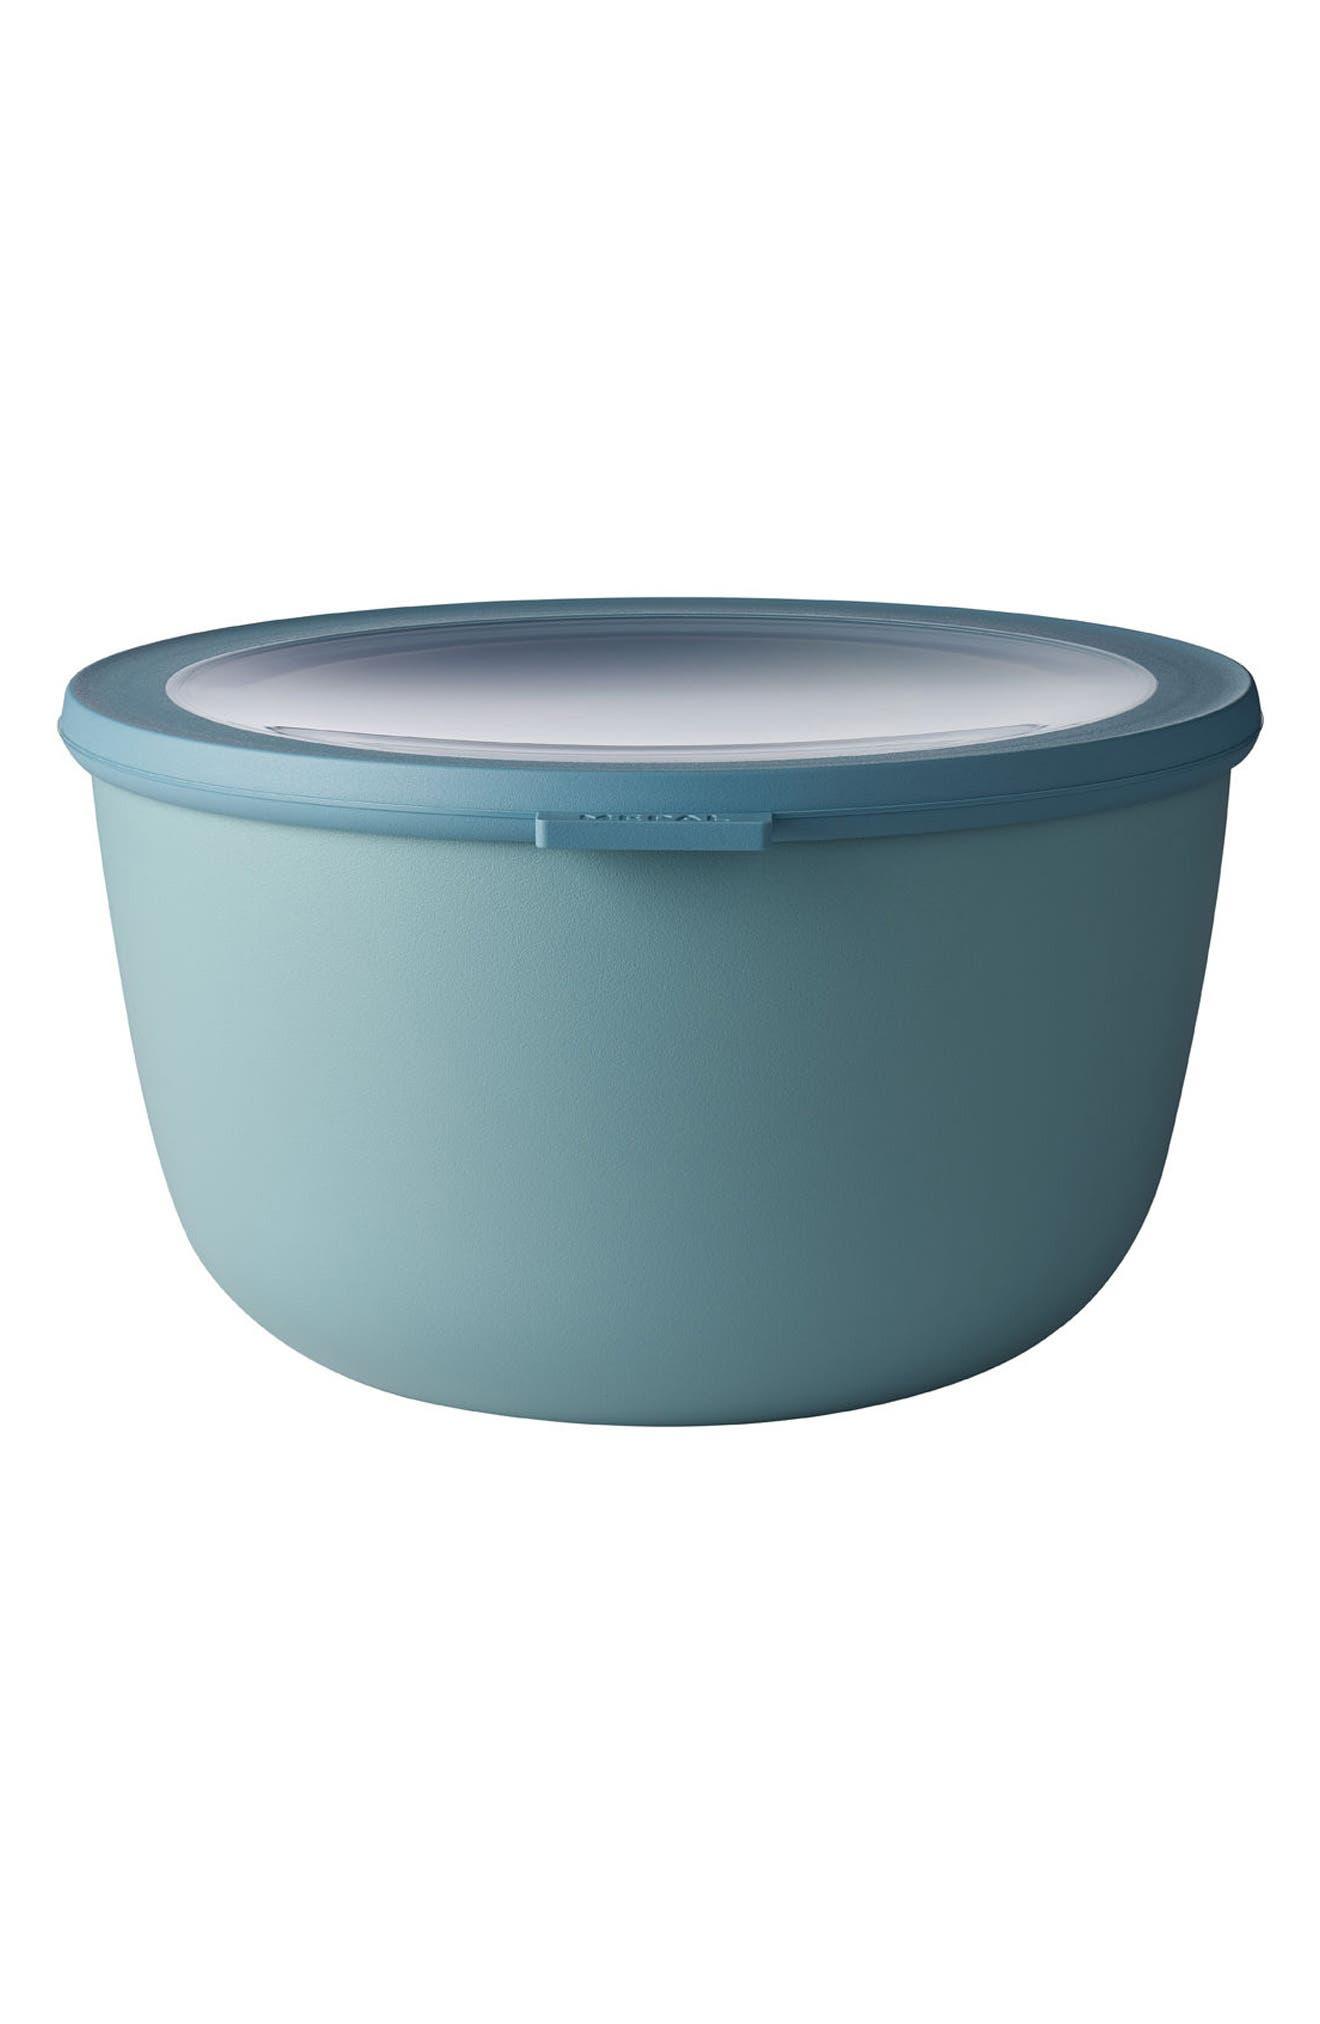 Cirqula Set of 4 Storage Bowls,                             Alternate thumbnail 4, color,                             Blue